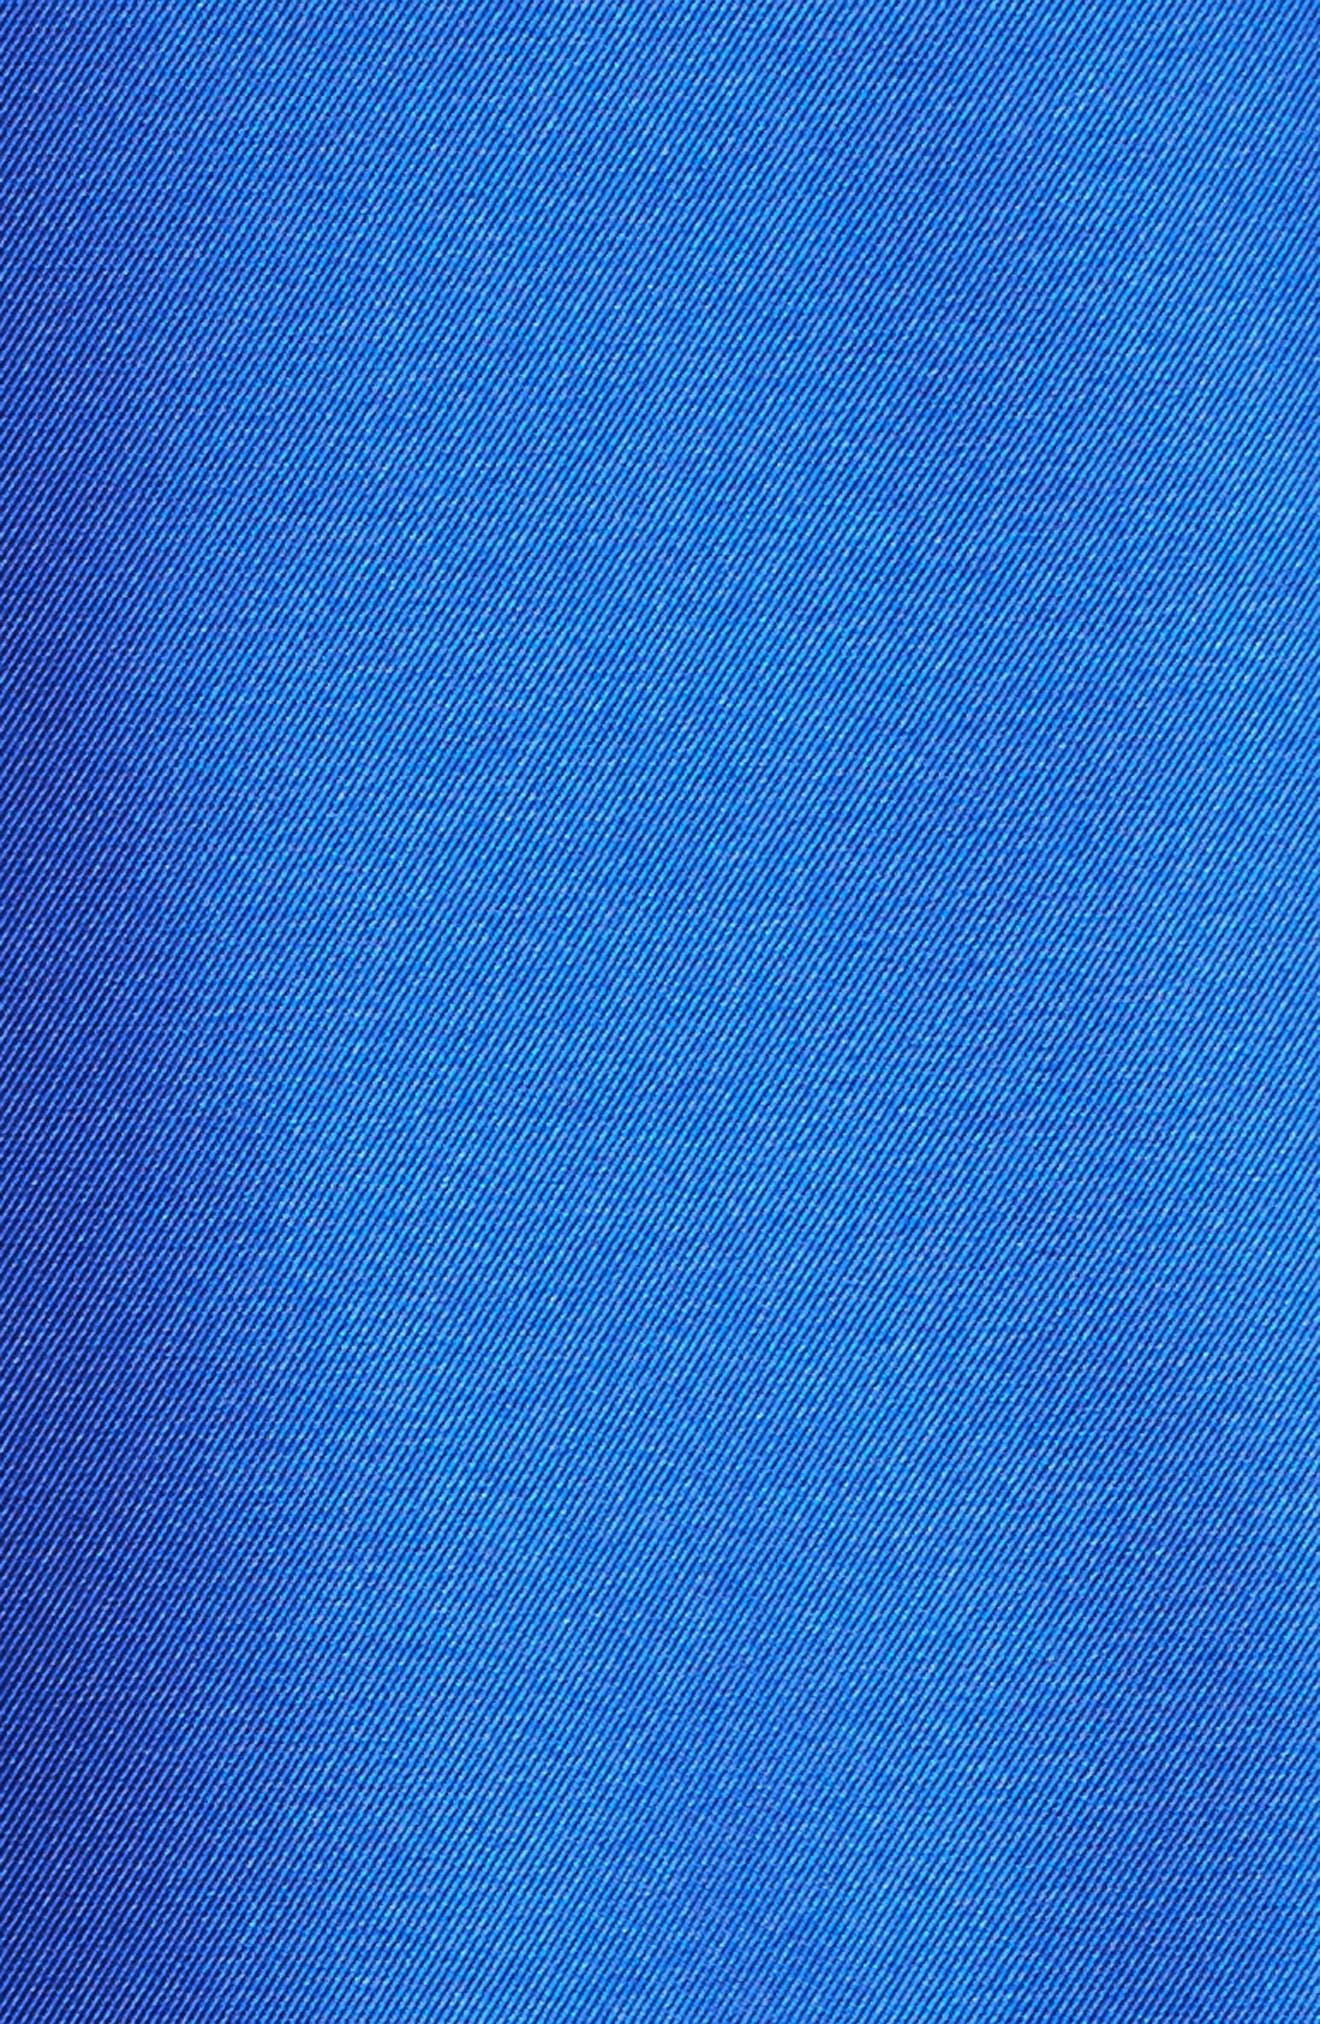 Lace Trim Mikado High/Low Gown,                             Alternate thumbnail 5, color,